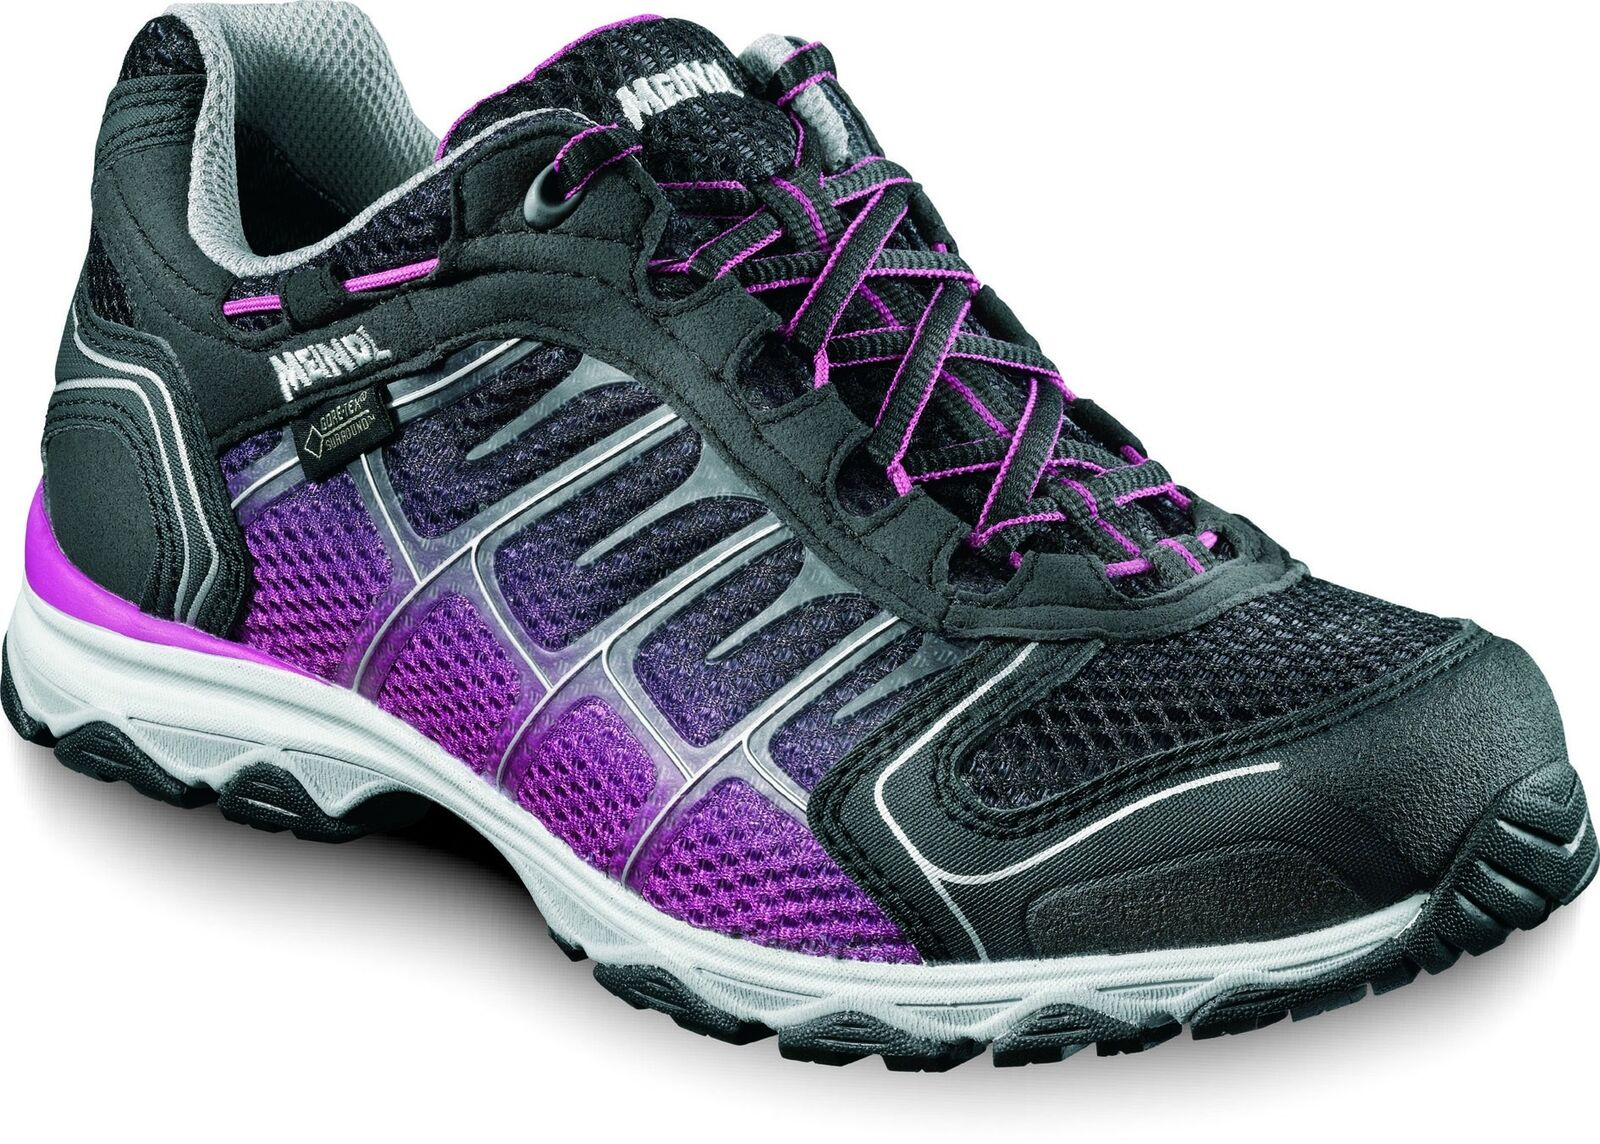 Meindl X-So 30 Lady GTX Zapatos Gore Tex Surround™ Zapatos GTX Informales Botas Senderismo f33247